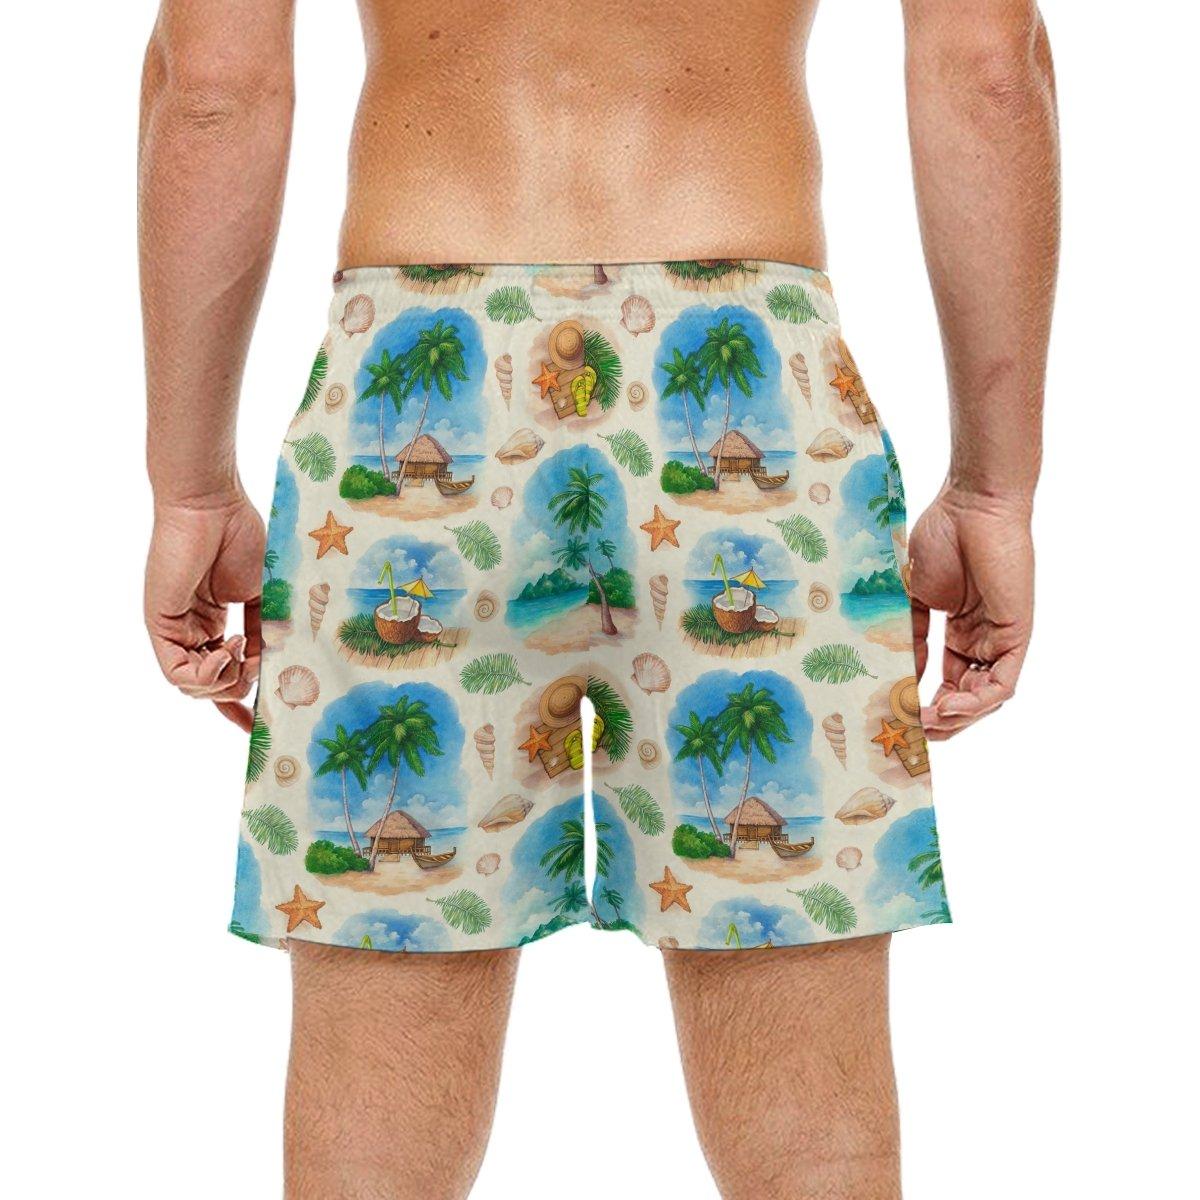 LORVIES Mens Tropical Pattern Beach Board Shorts Quick Dry Swim Trunk